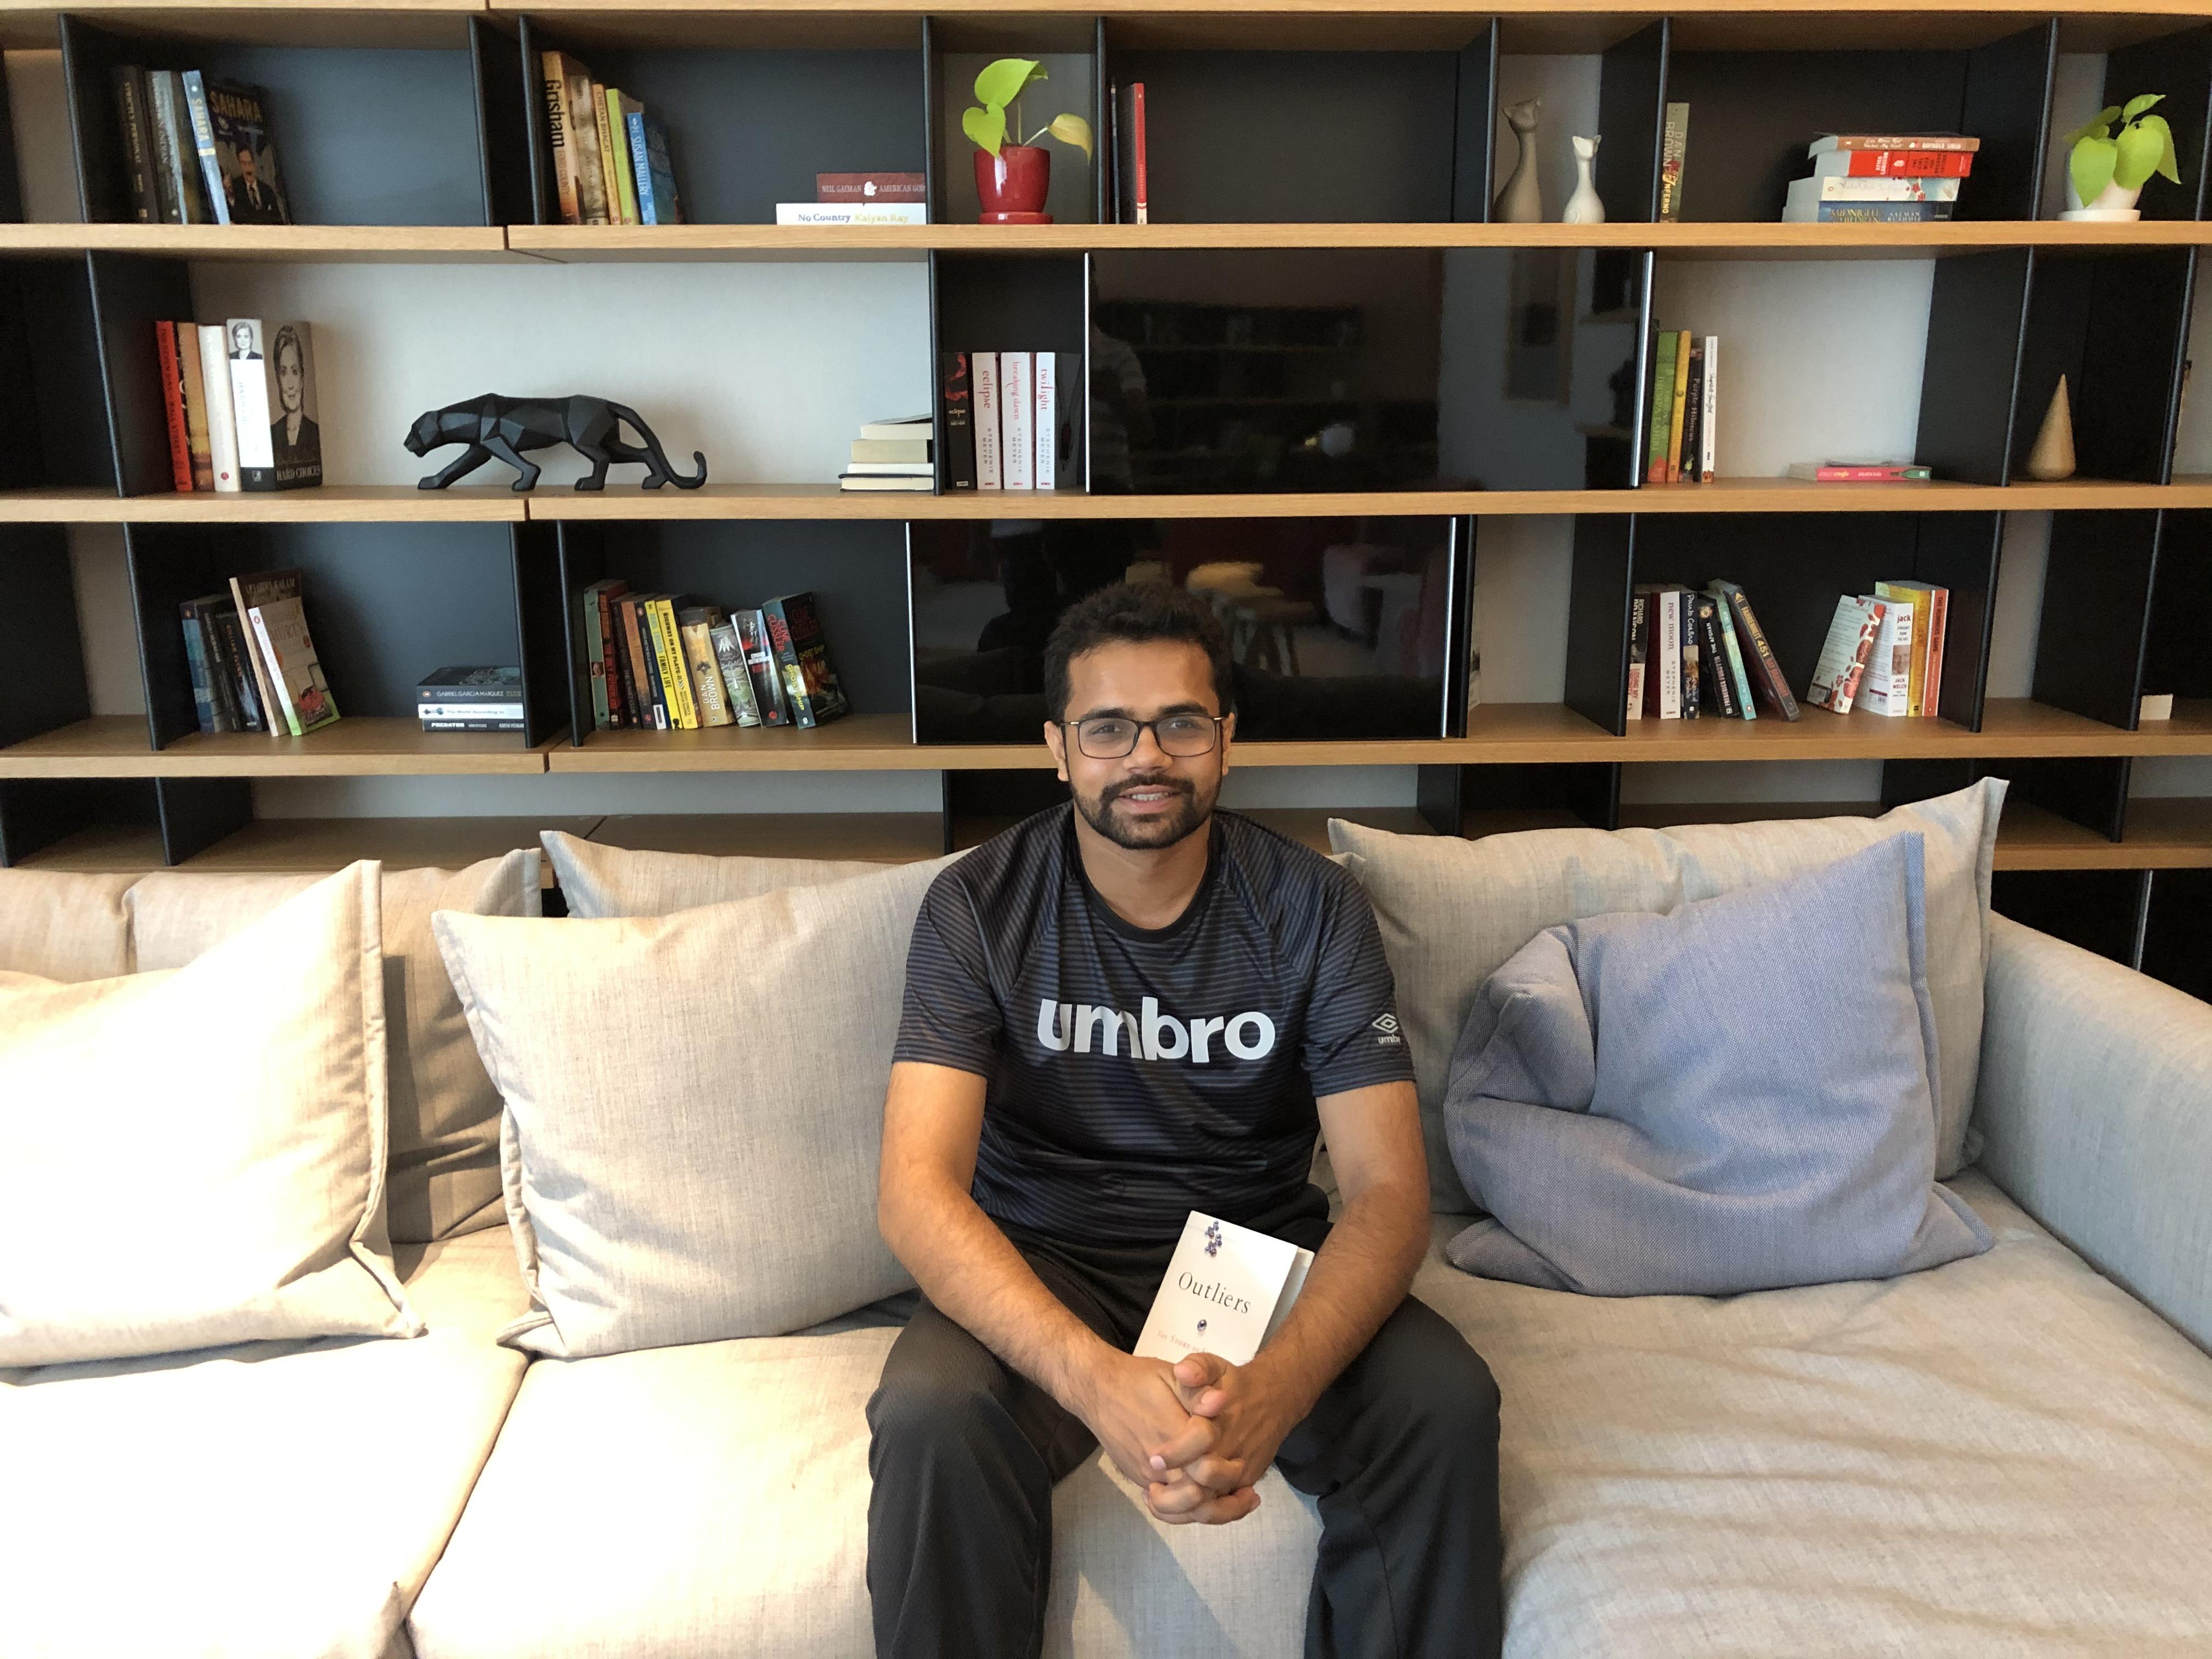 Manan Verma's Logic of Fulfilment Helps People Boost Their Career